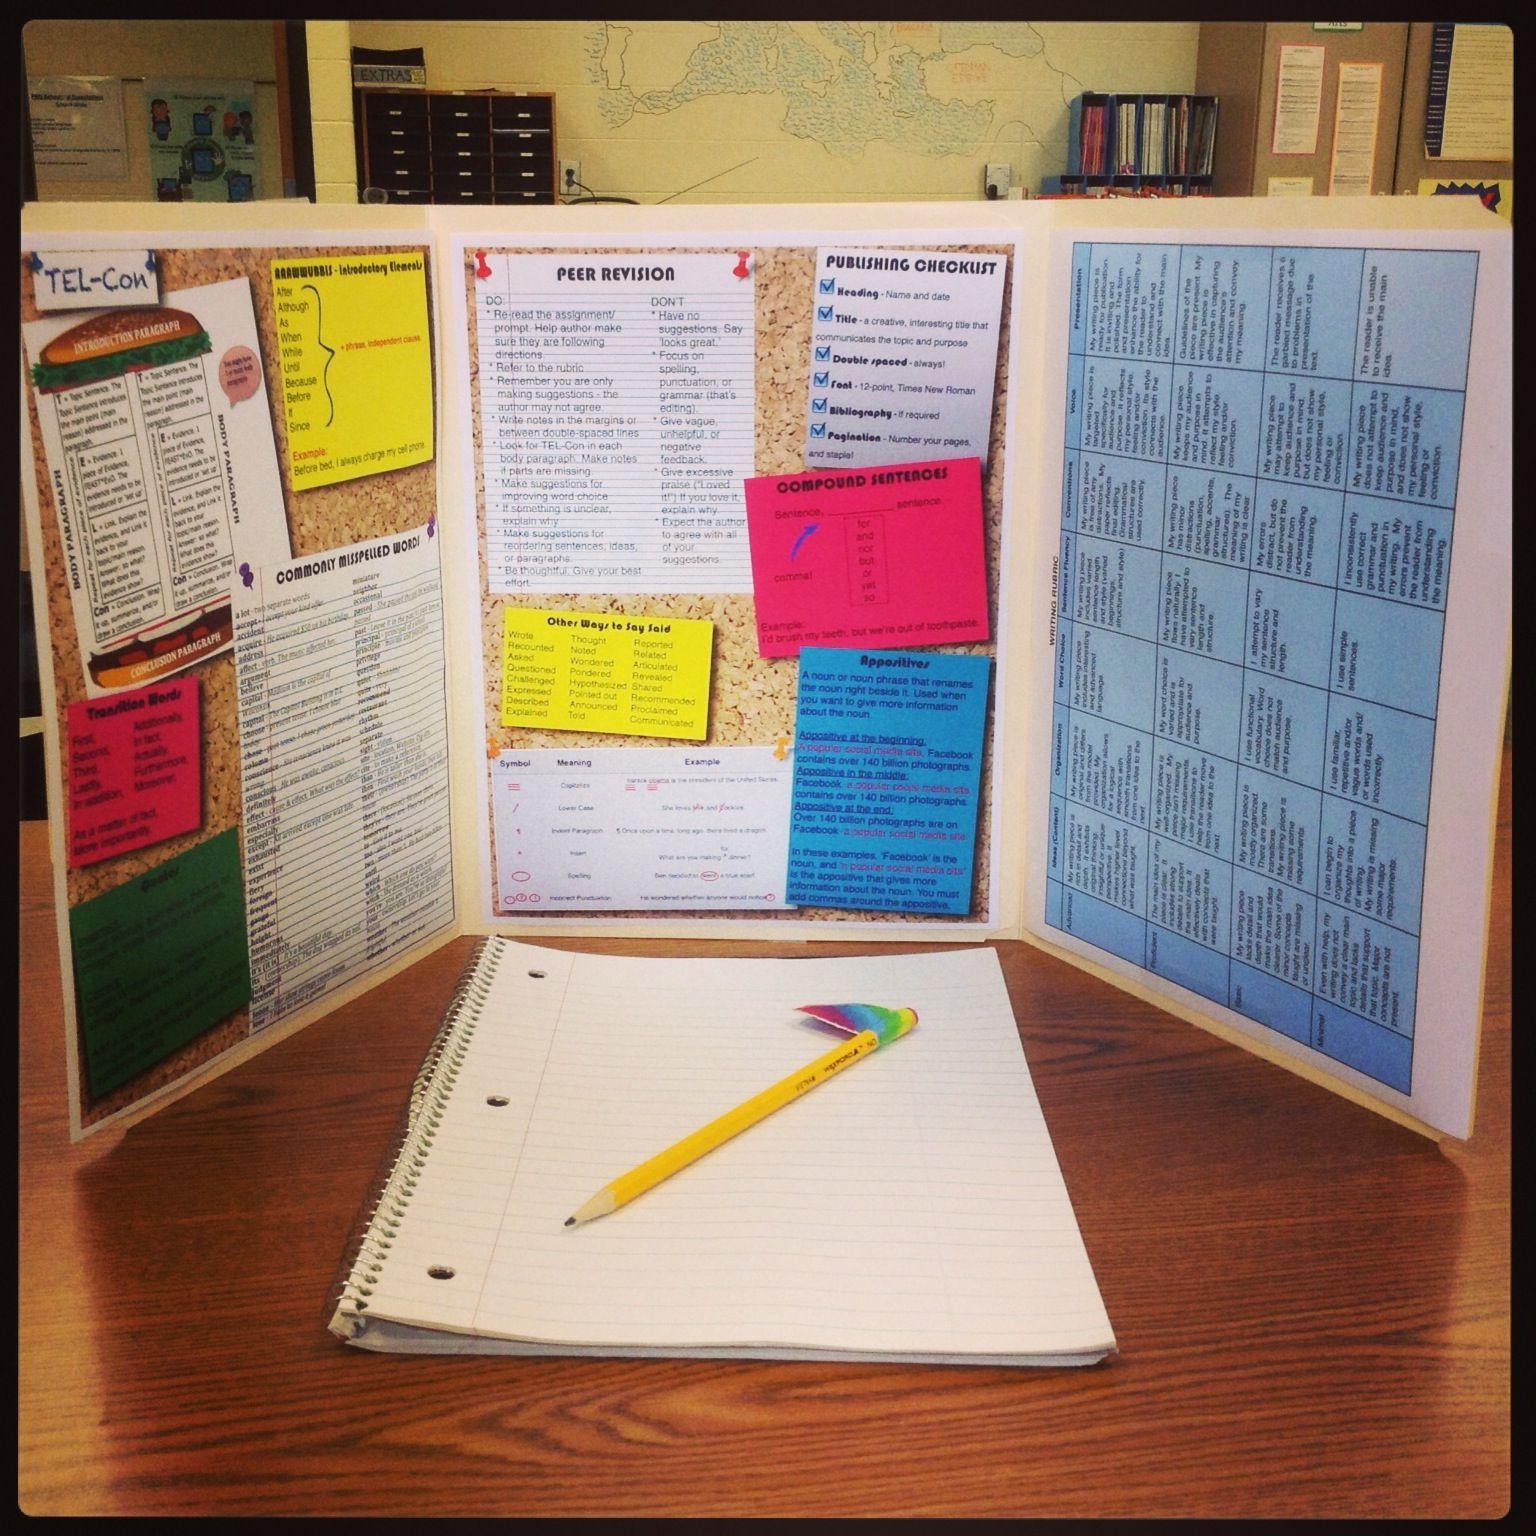 Writ G Desk Reference Sheet Edit G Revisi Writ G